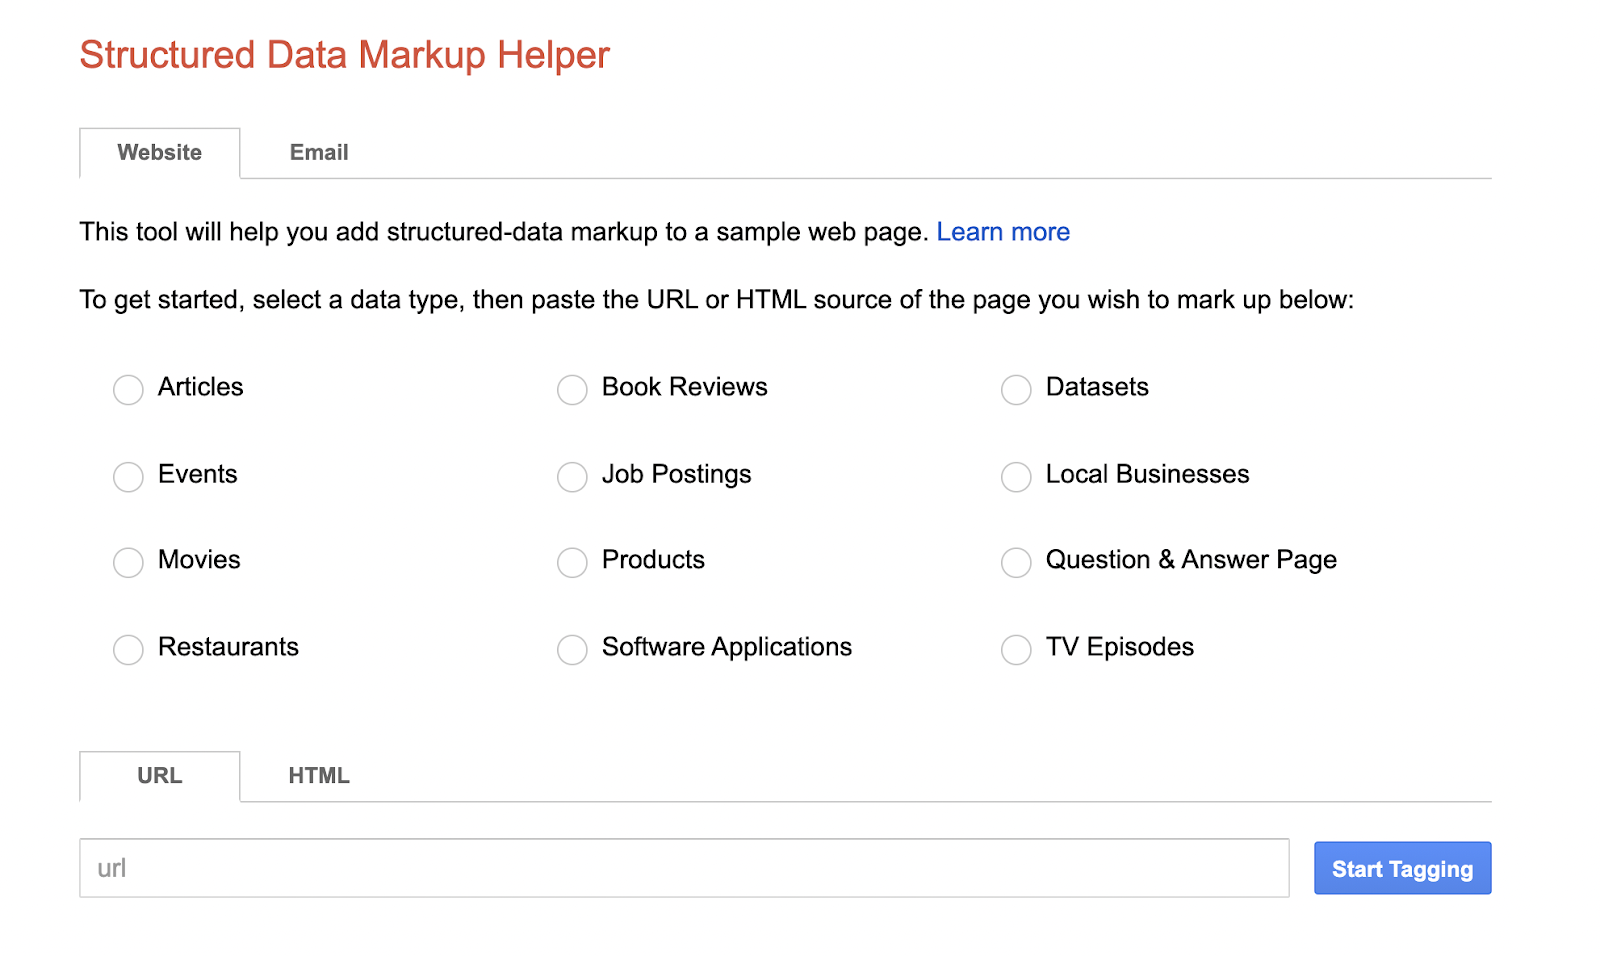 50 SEO Tools - Structured data markup helper - start tagging